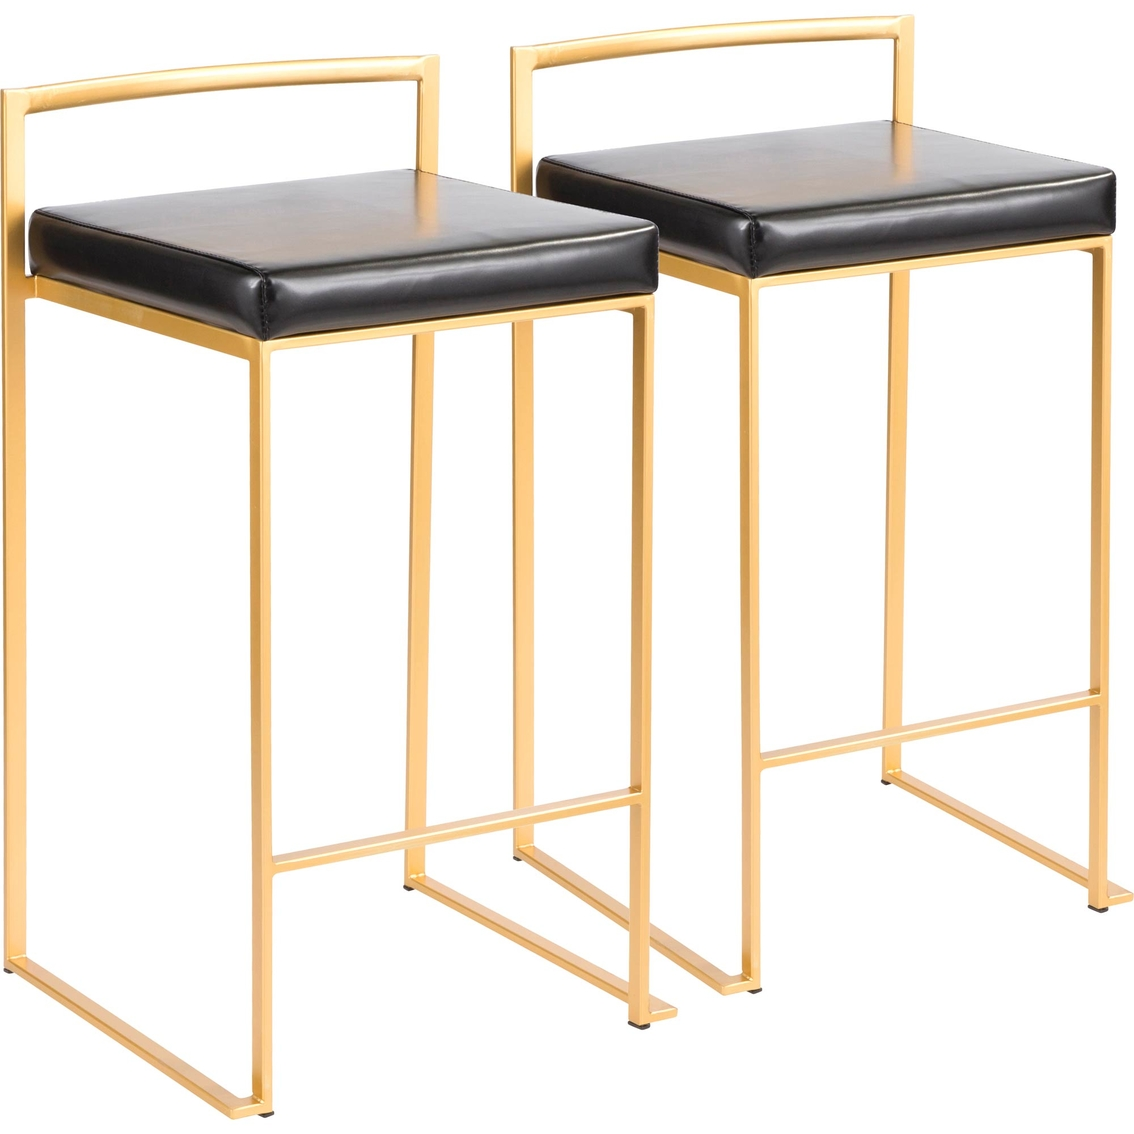 Lumisource Fuji Goldtone Frame Faux Leather Stacker Counter Stool 2 Pk